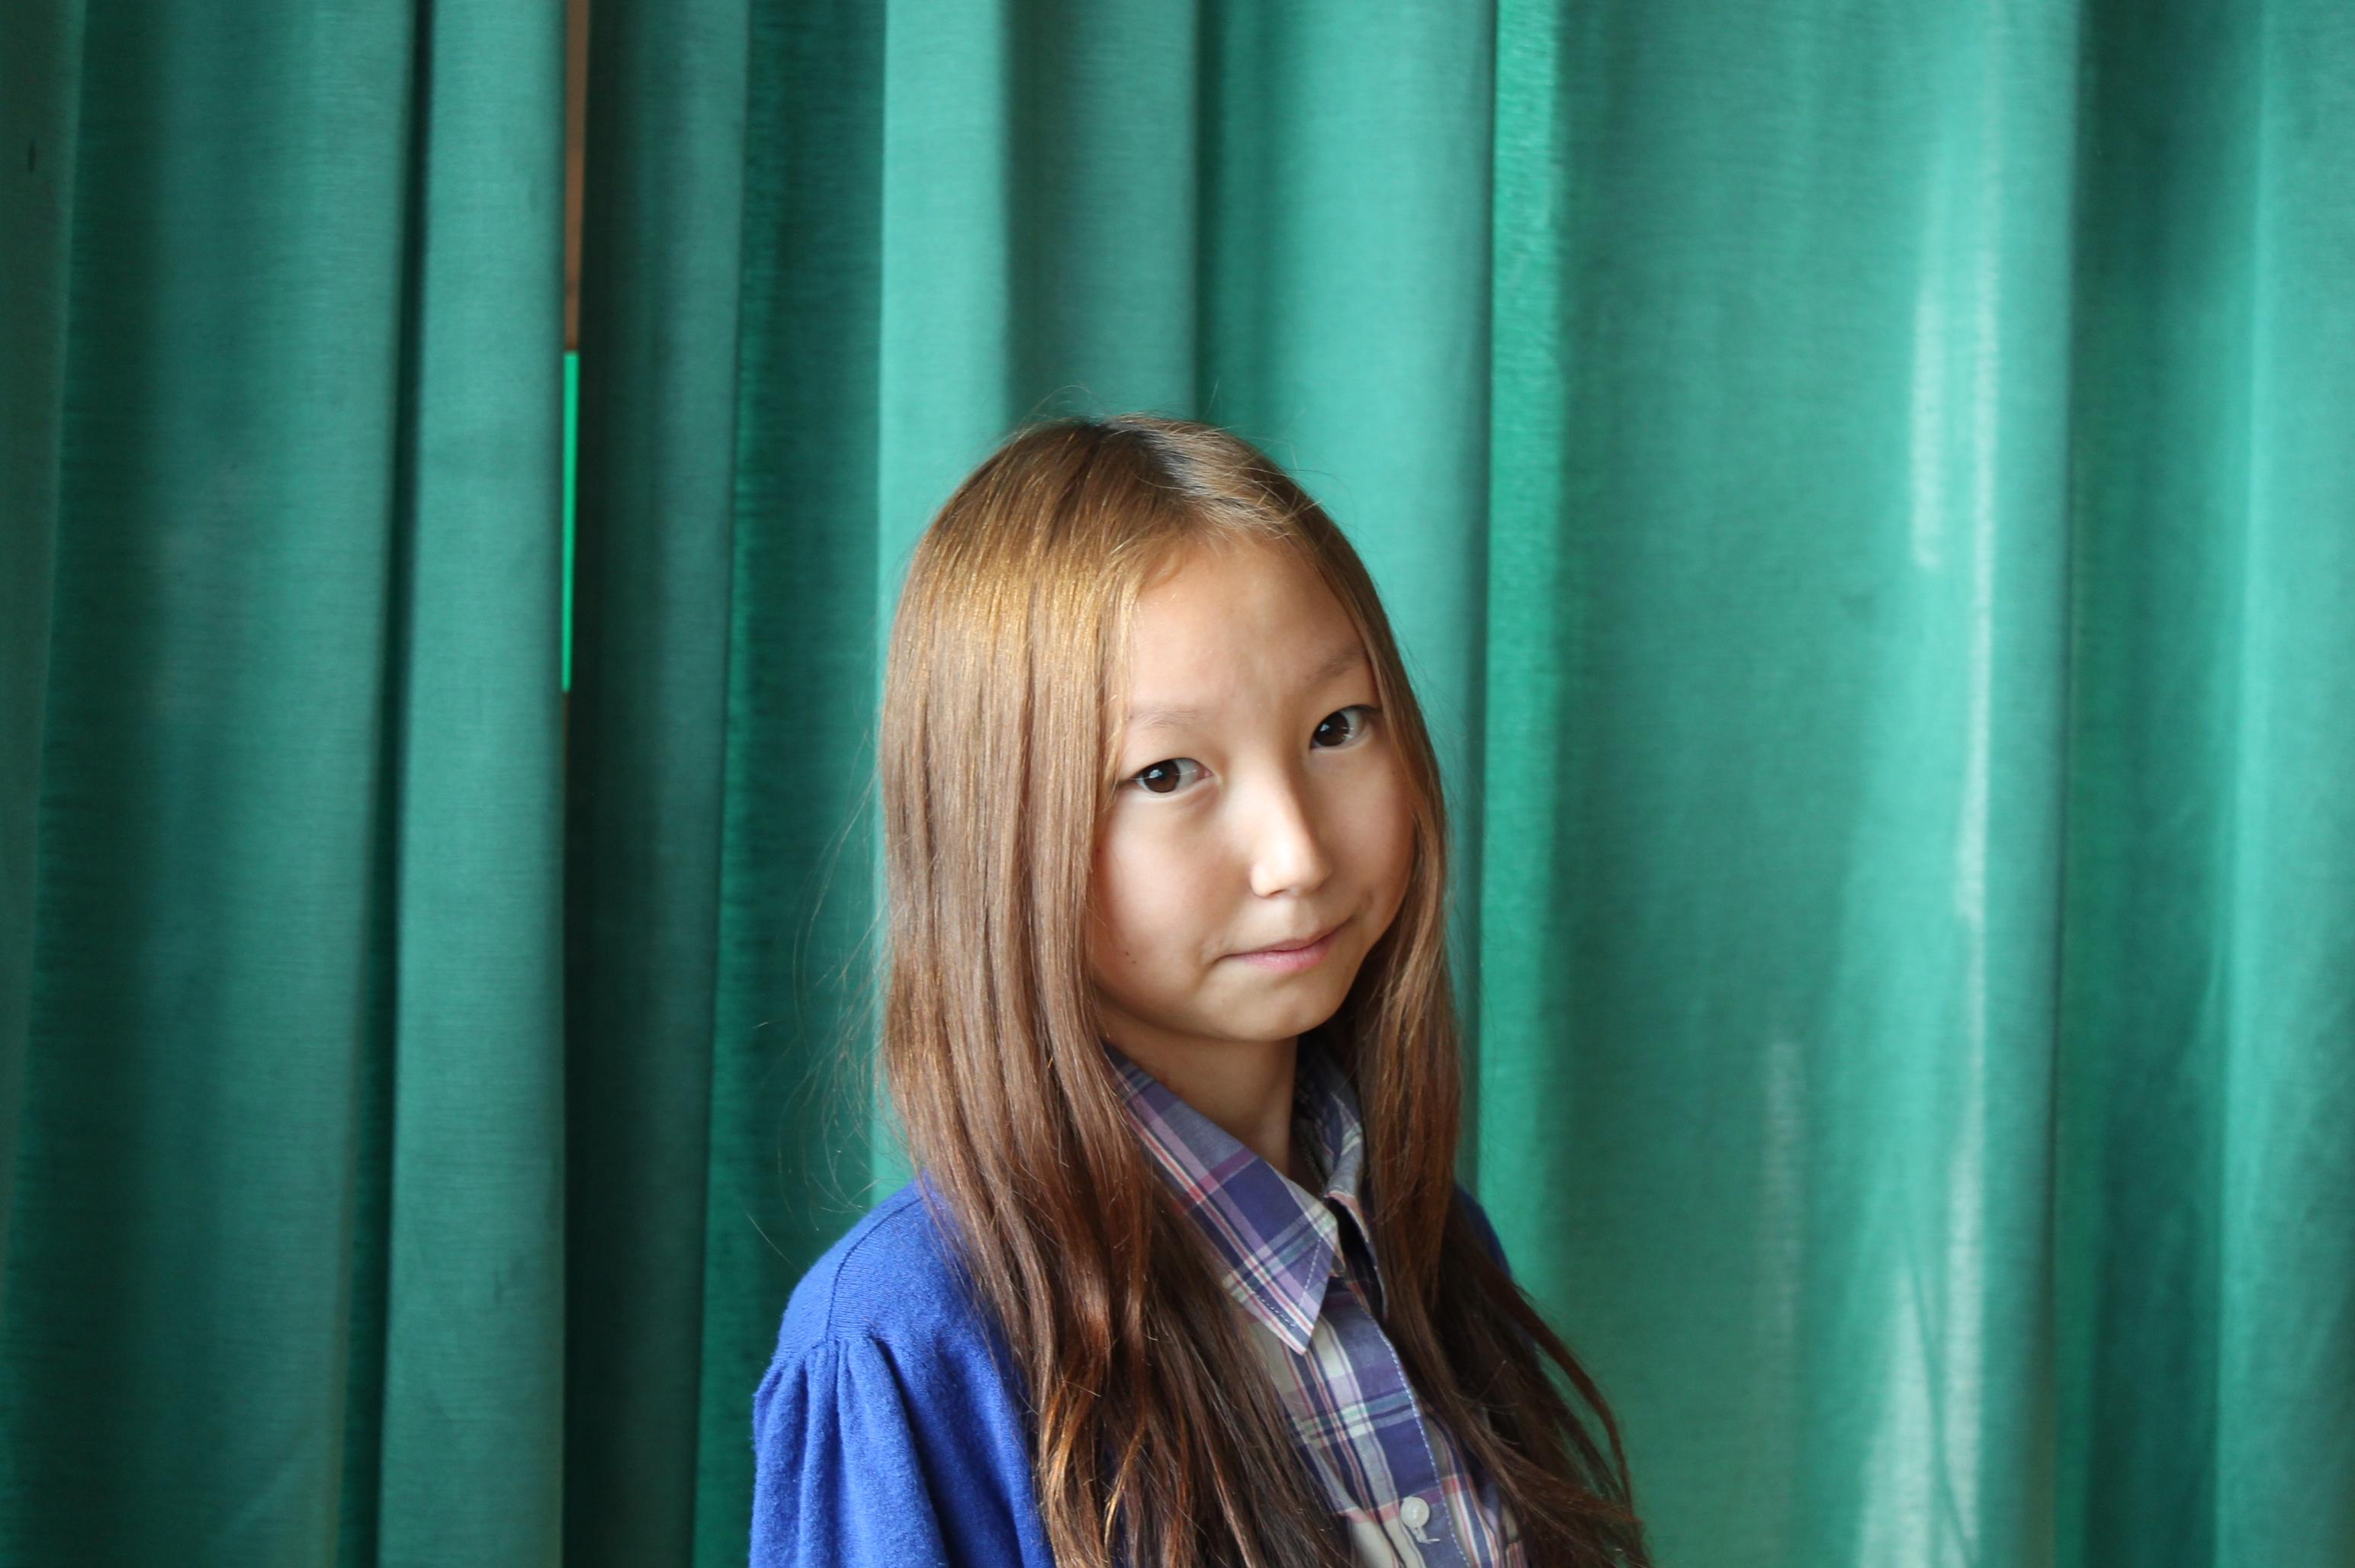 Филиппова Вероника, студентка Ю-32